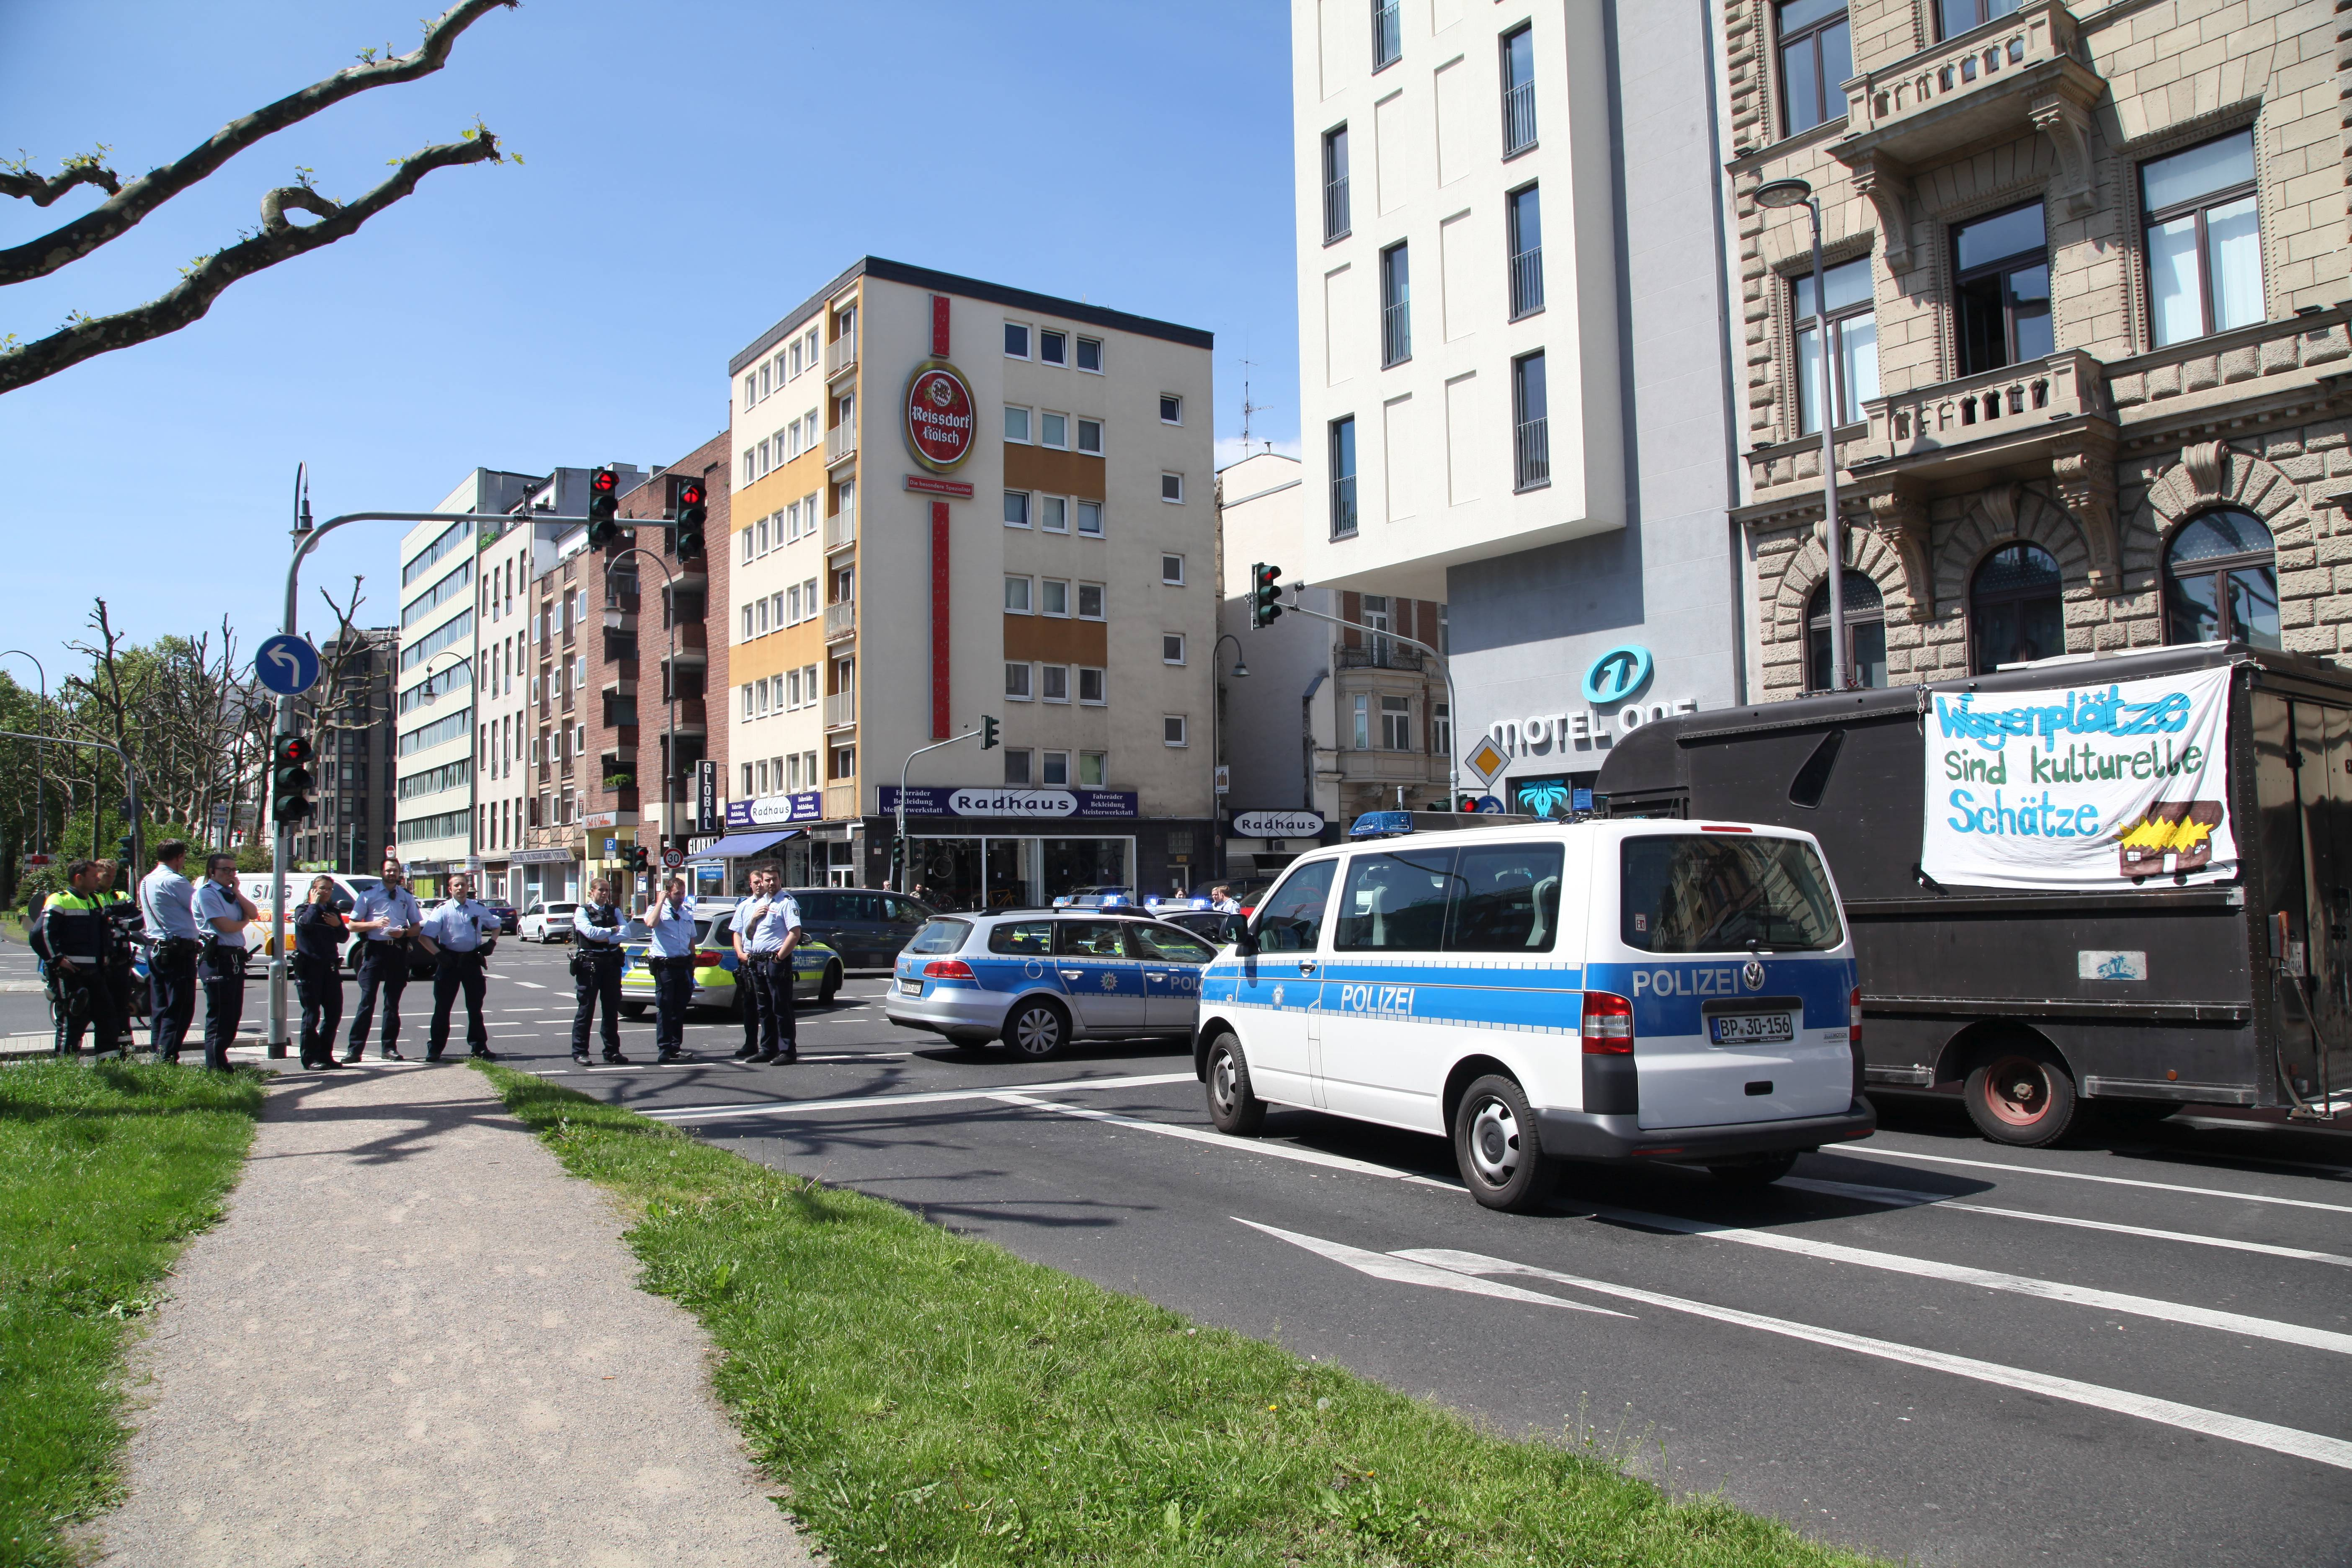 Konvoi Polizeipraesenz